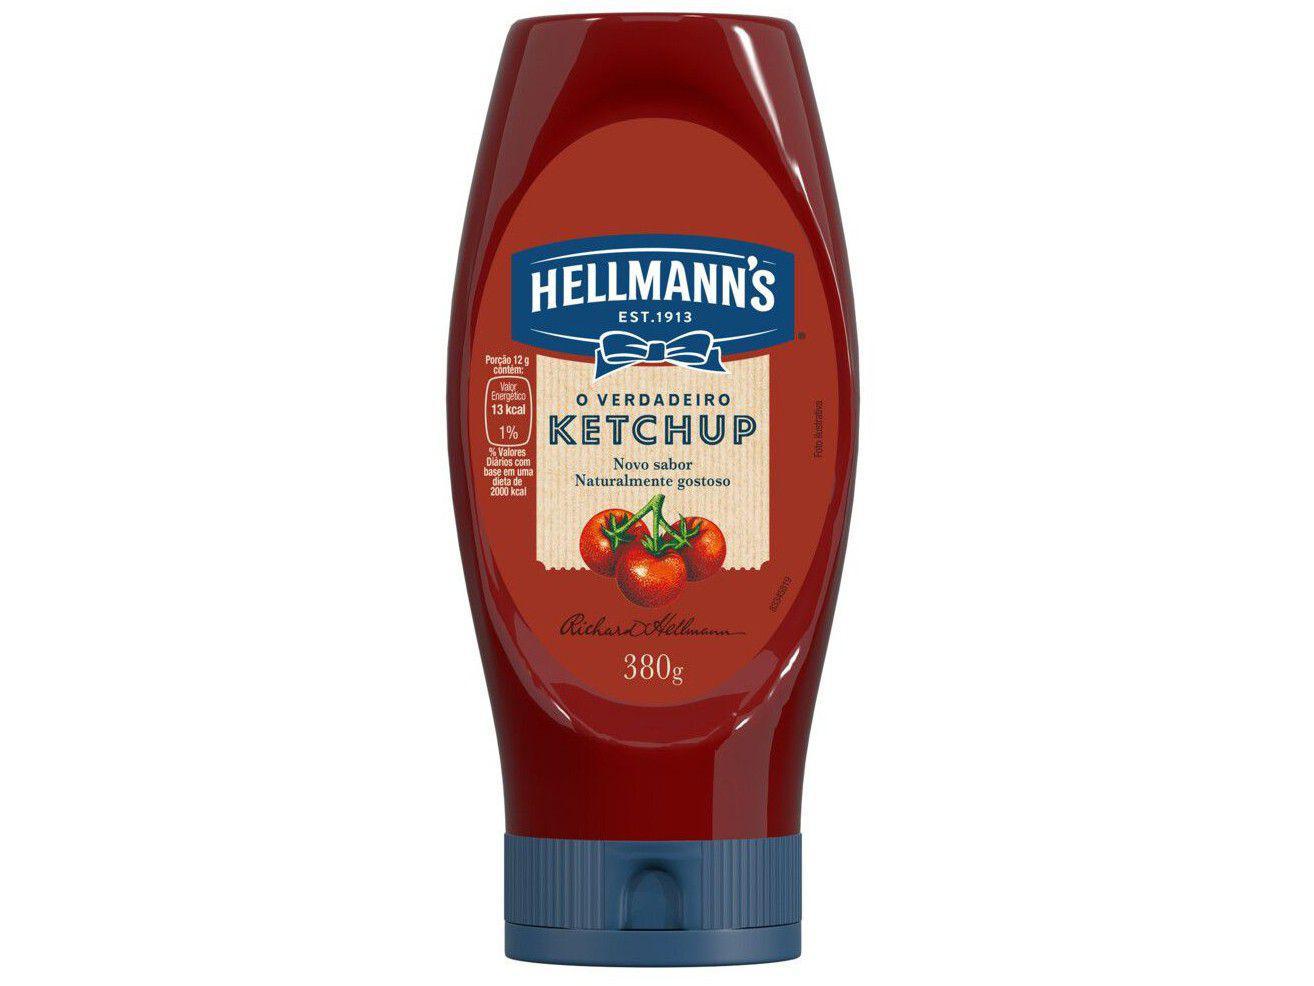 Ketchup Tradicional Hellmanns 380g